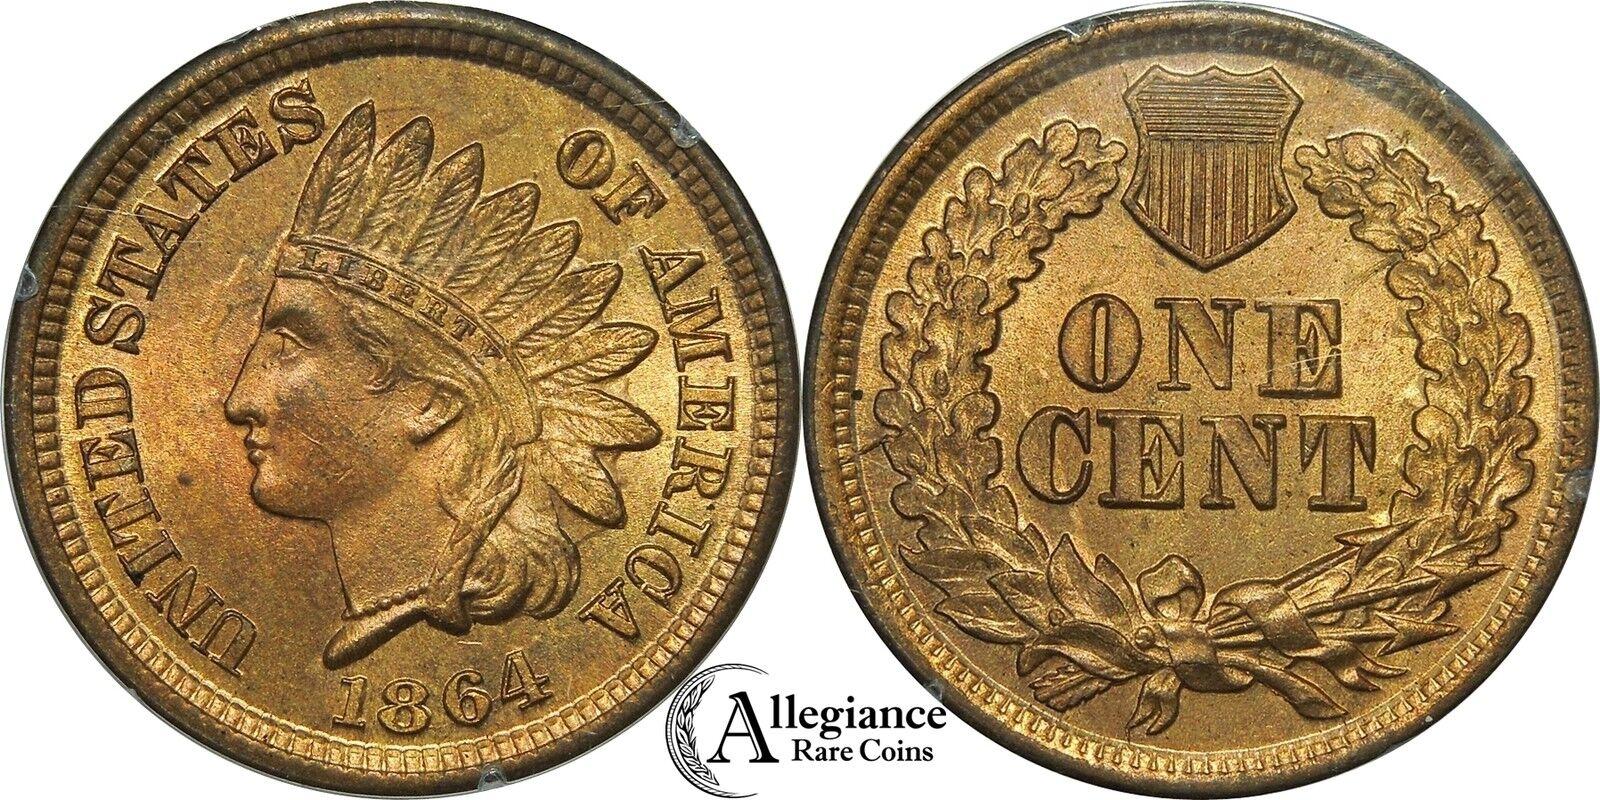 Allegiance Rare Coins